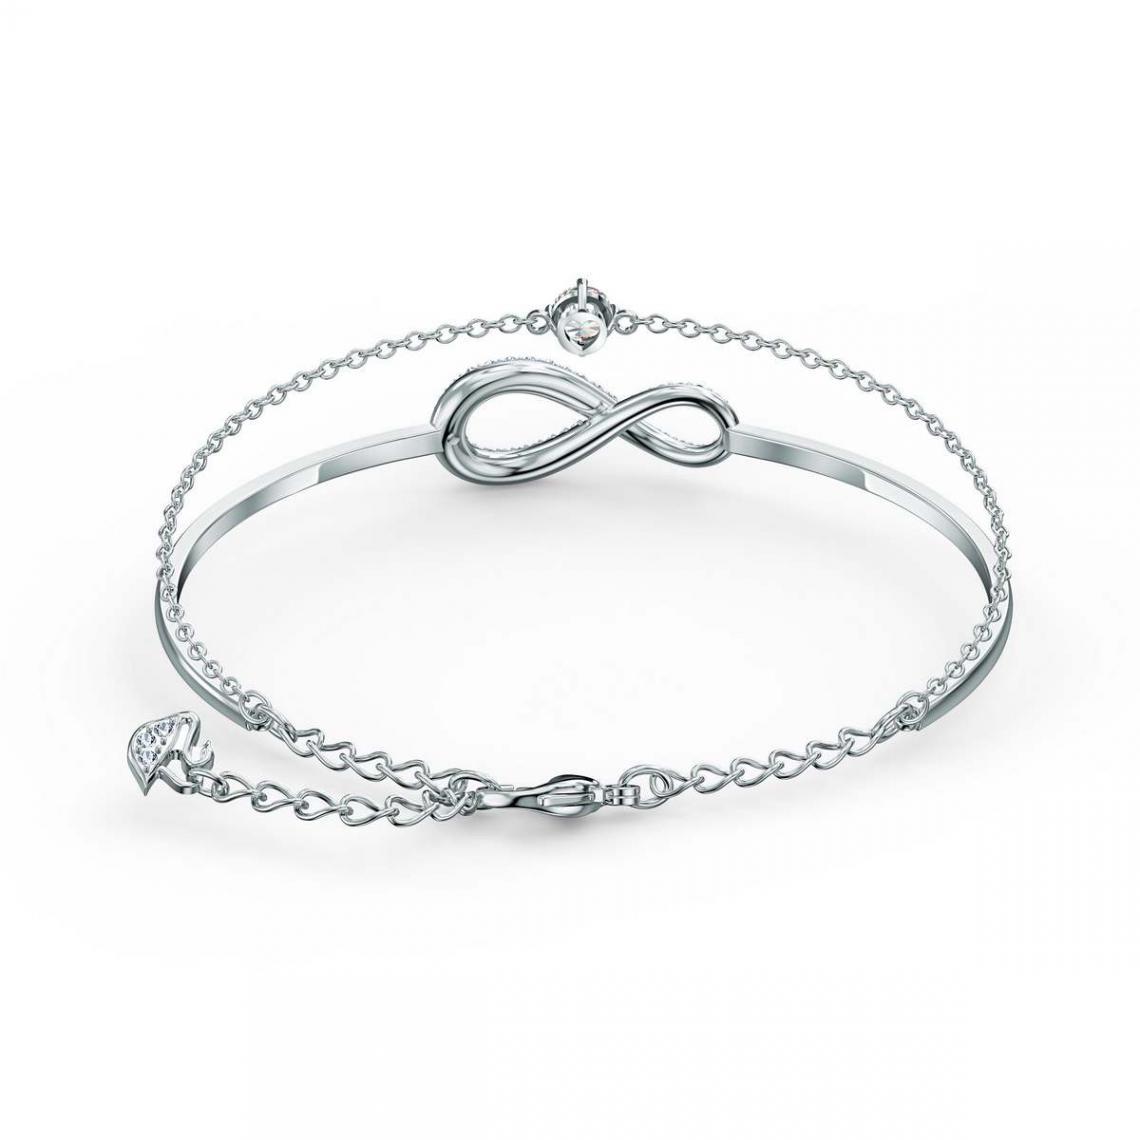 Bracelet Swarovski 5520584 - Bracelet argenté infini Femme | 3 SUISSES